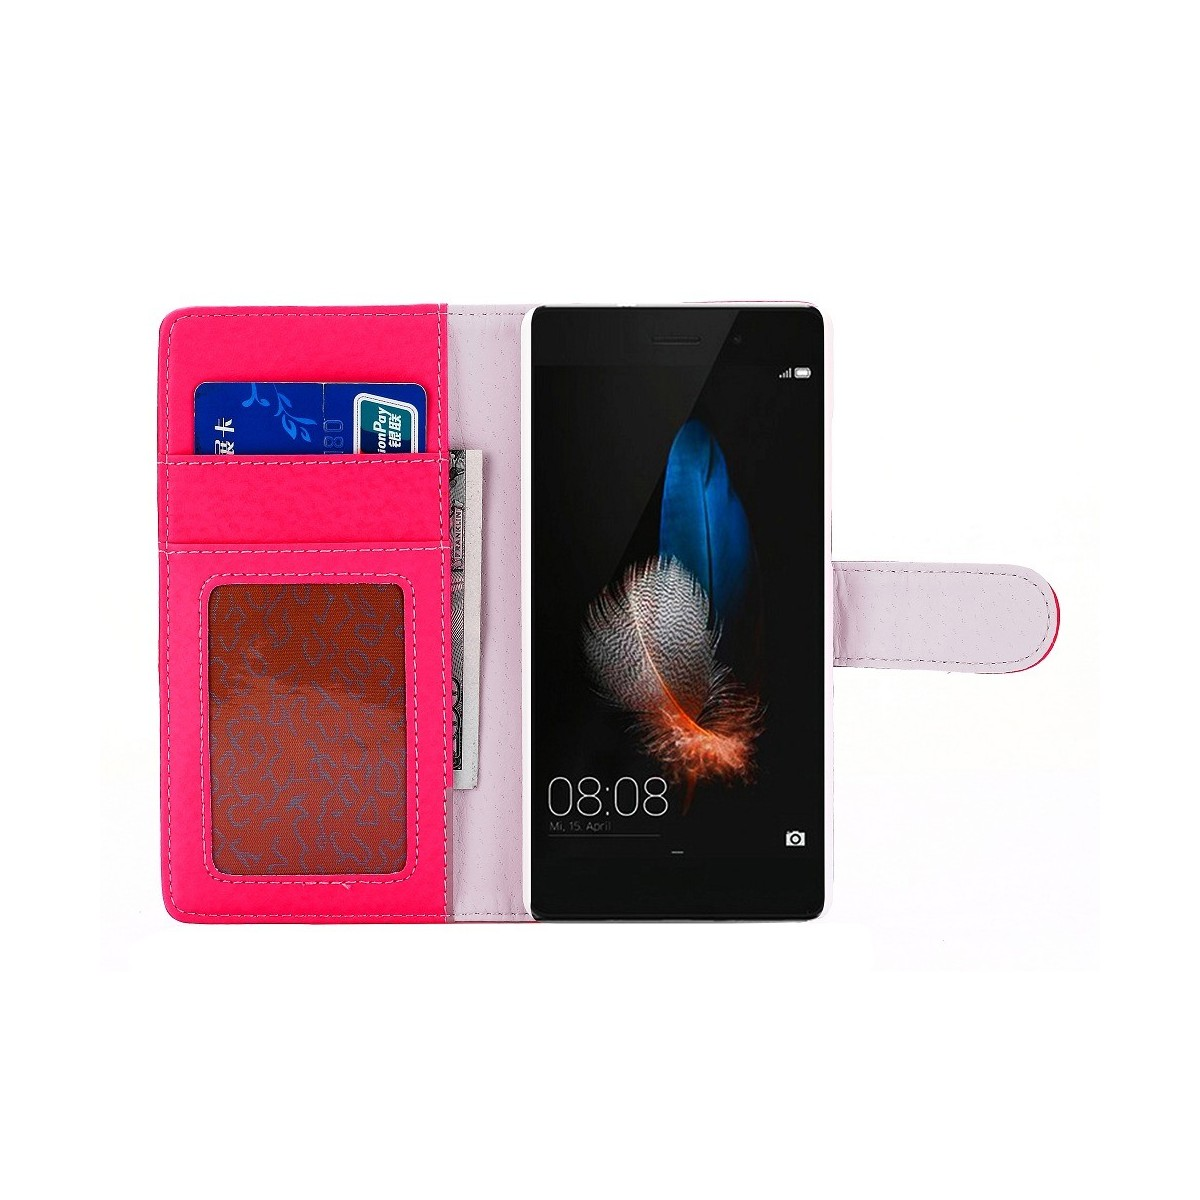 Etui Huawei P8 Lite Portecartes Rouge - Crazy Kase